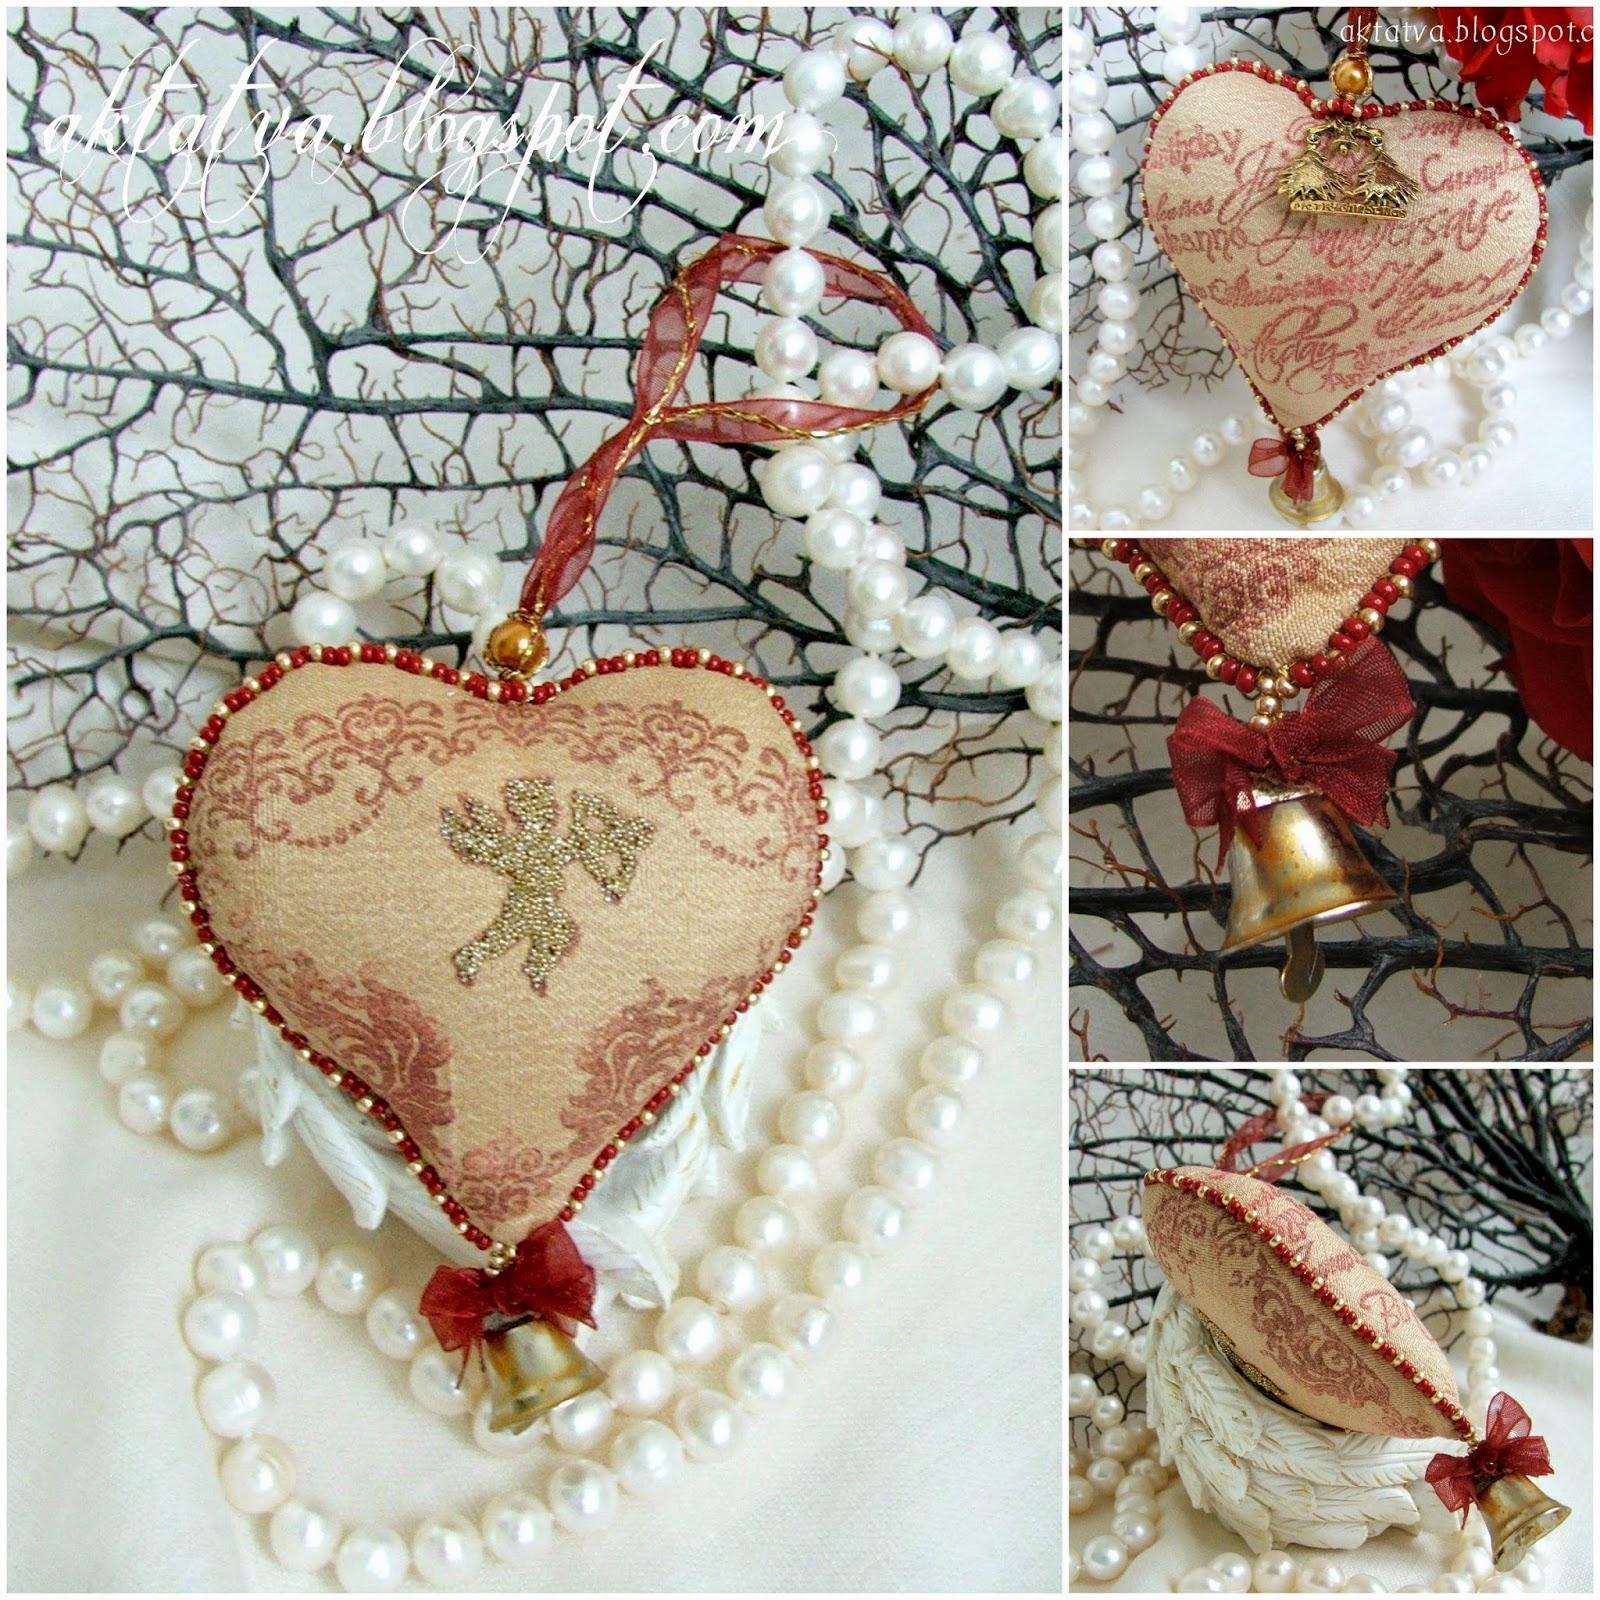 вышивка натальи молодецкой схемы сад сердец